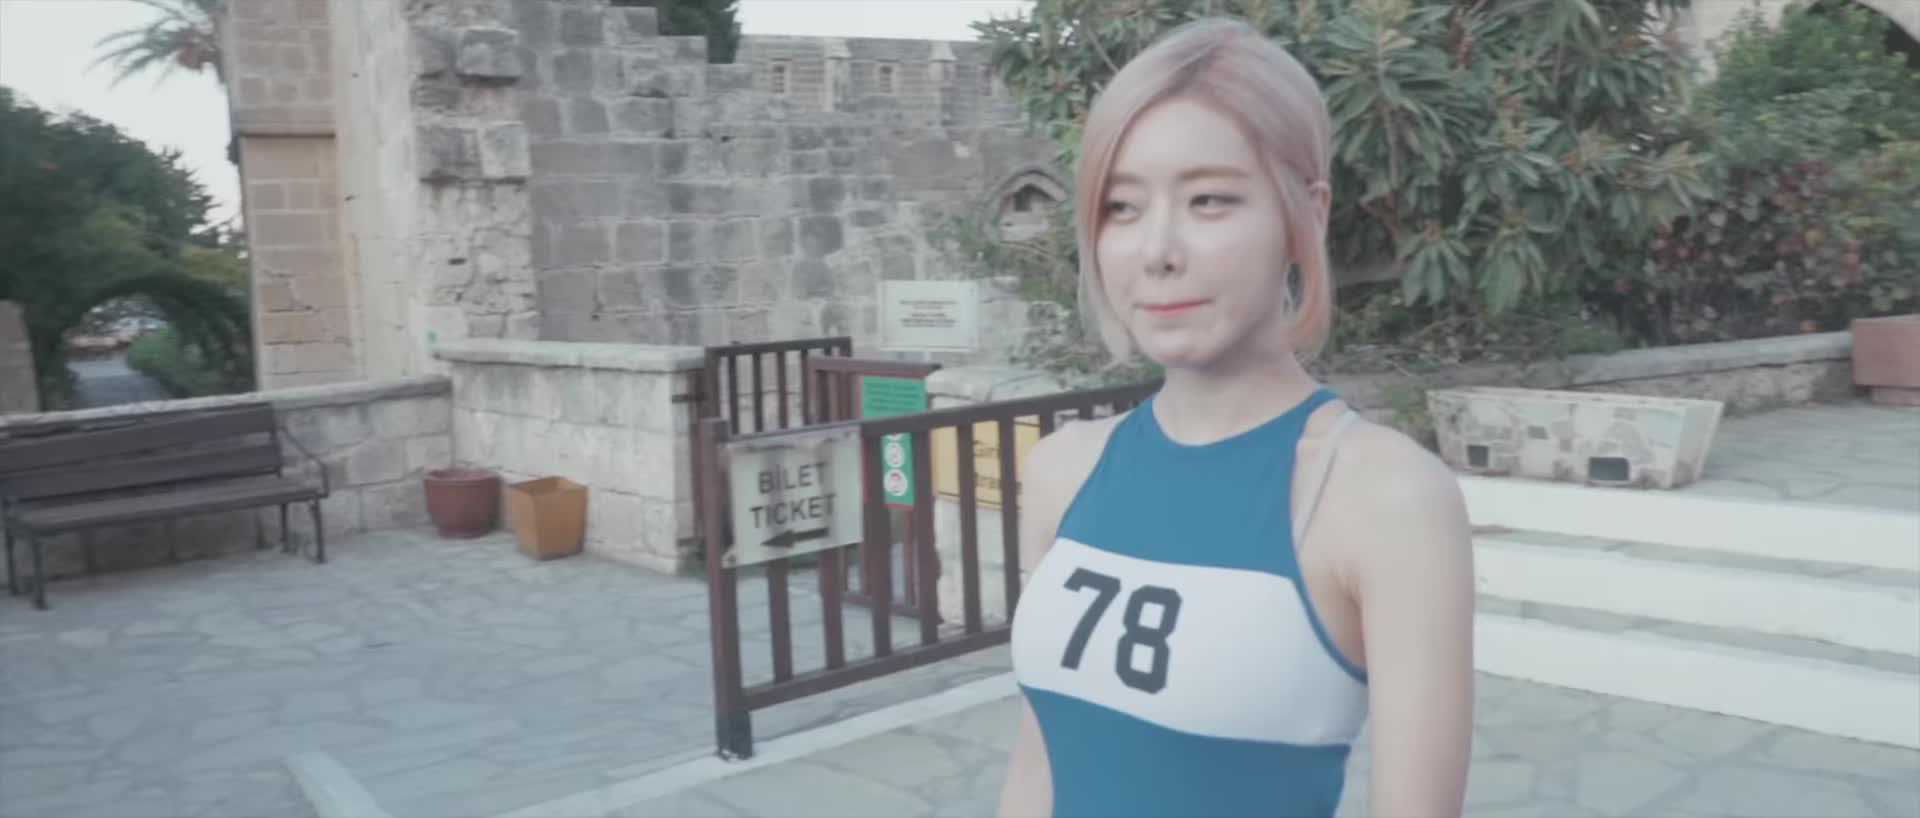 dj soda, korean dj, soda, DJ SODA - CYPRUS A GIFs